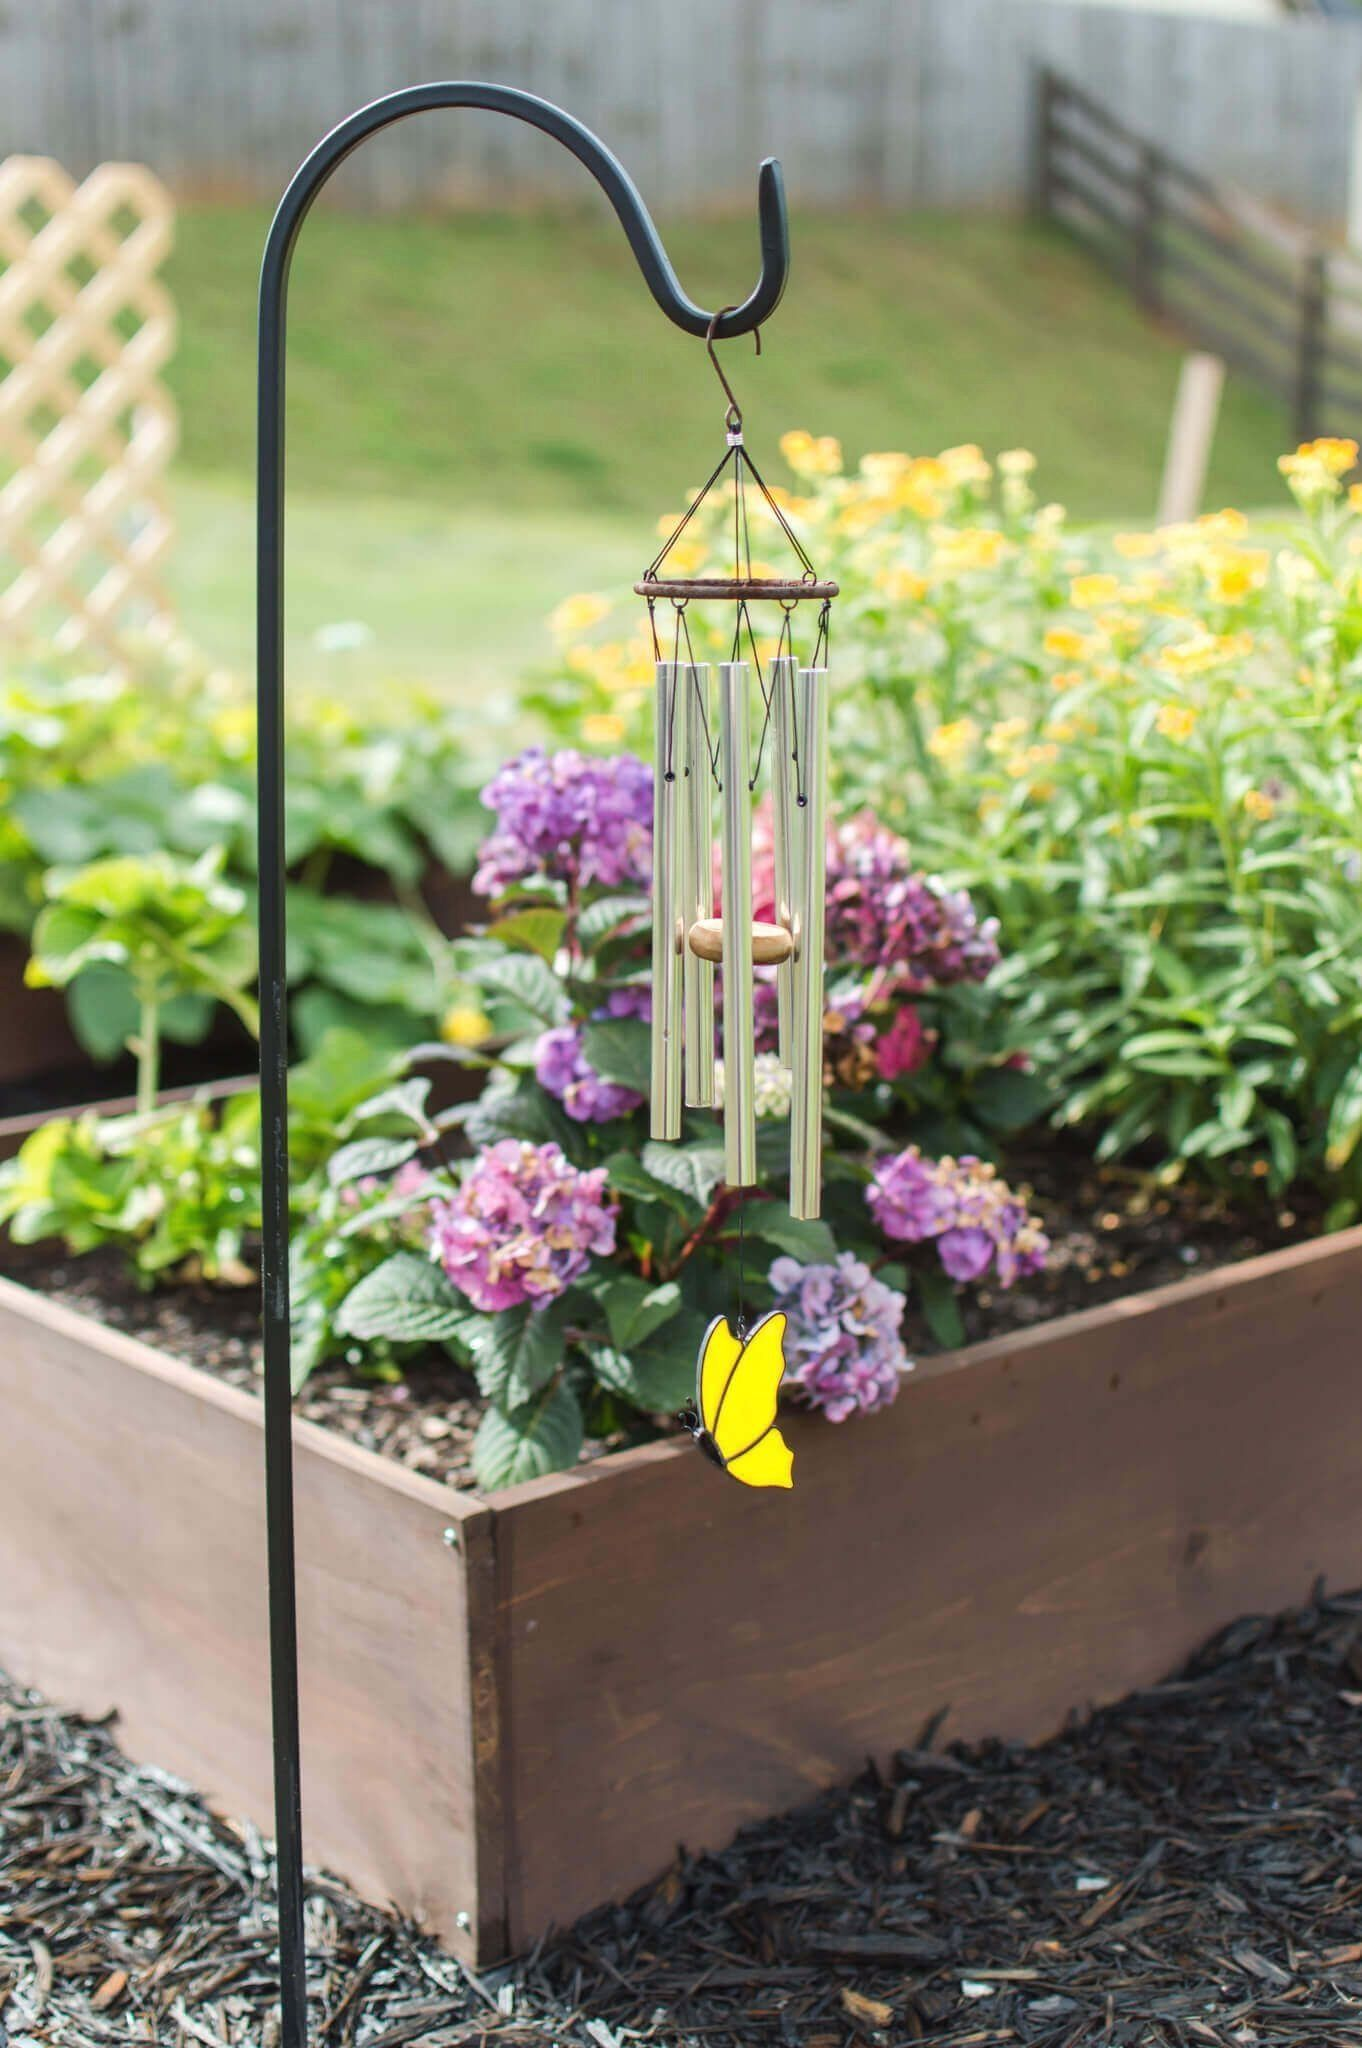 Our Beginner Gardening Tips / Raised Garden Bed Tips A